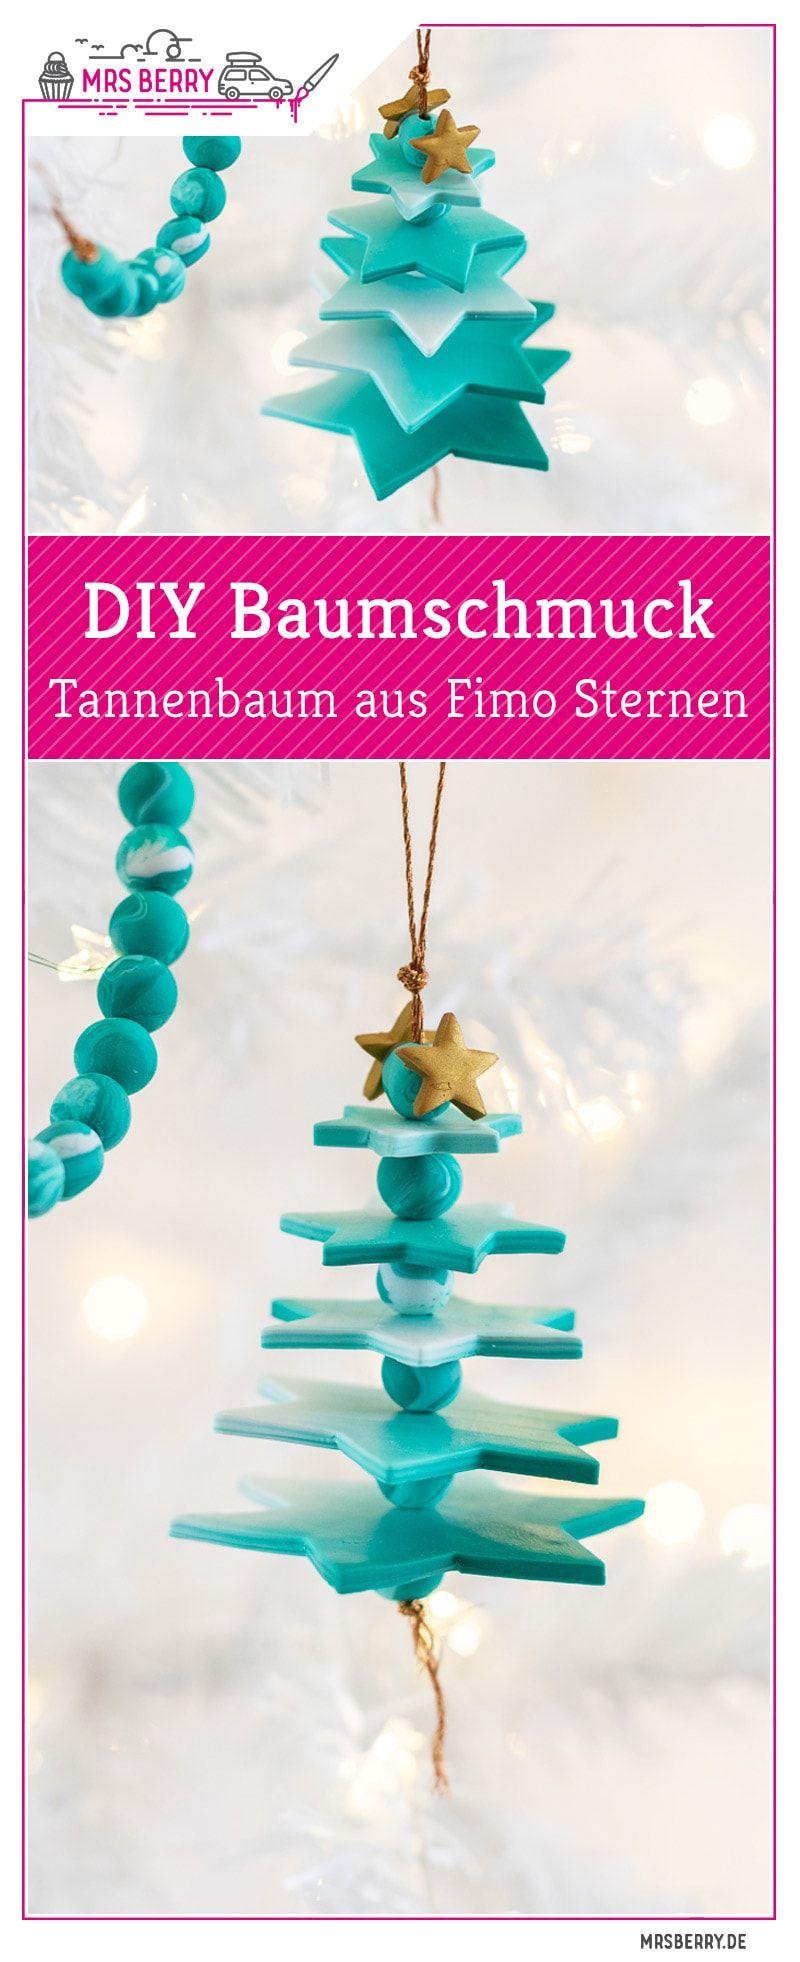 DIY Baumschmuck: Tannenbaum aus Fimo Sternen   MrsBerry.de #christbaumschmuckbastelnkinder